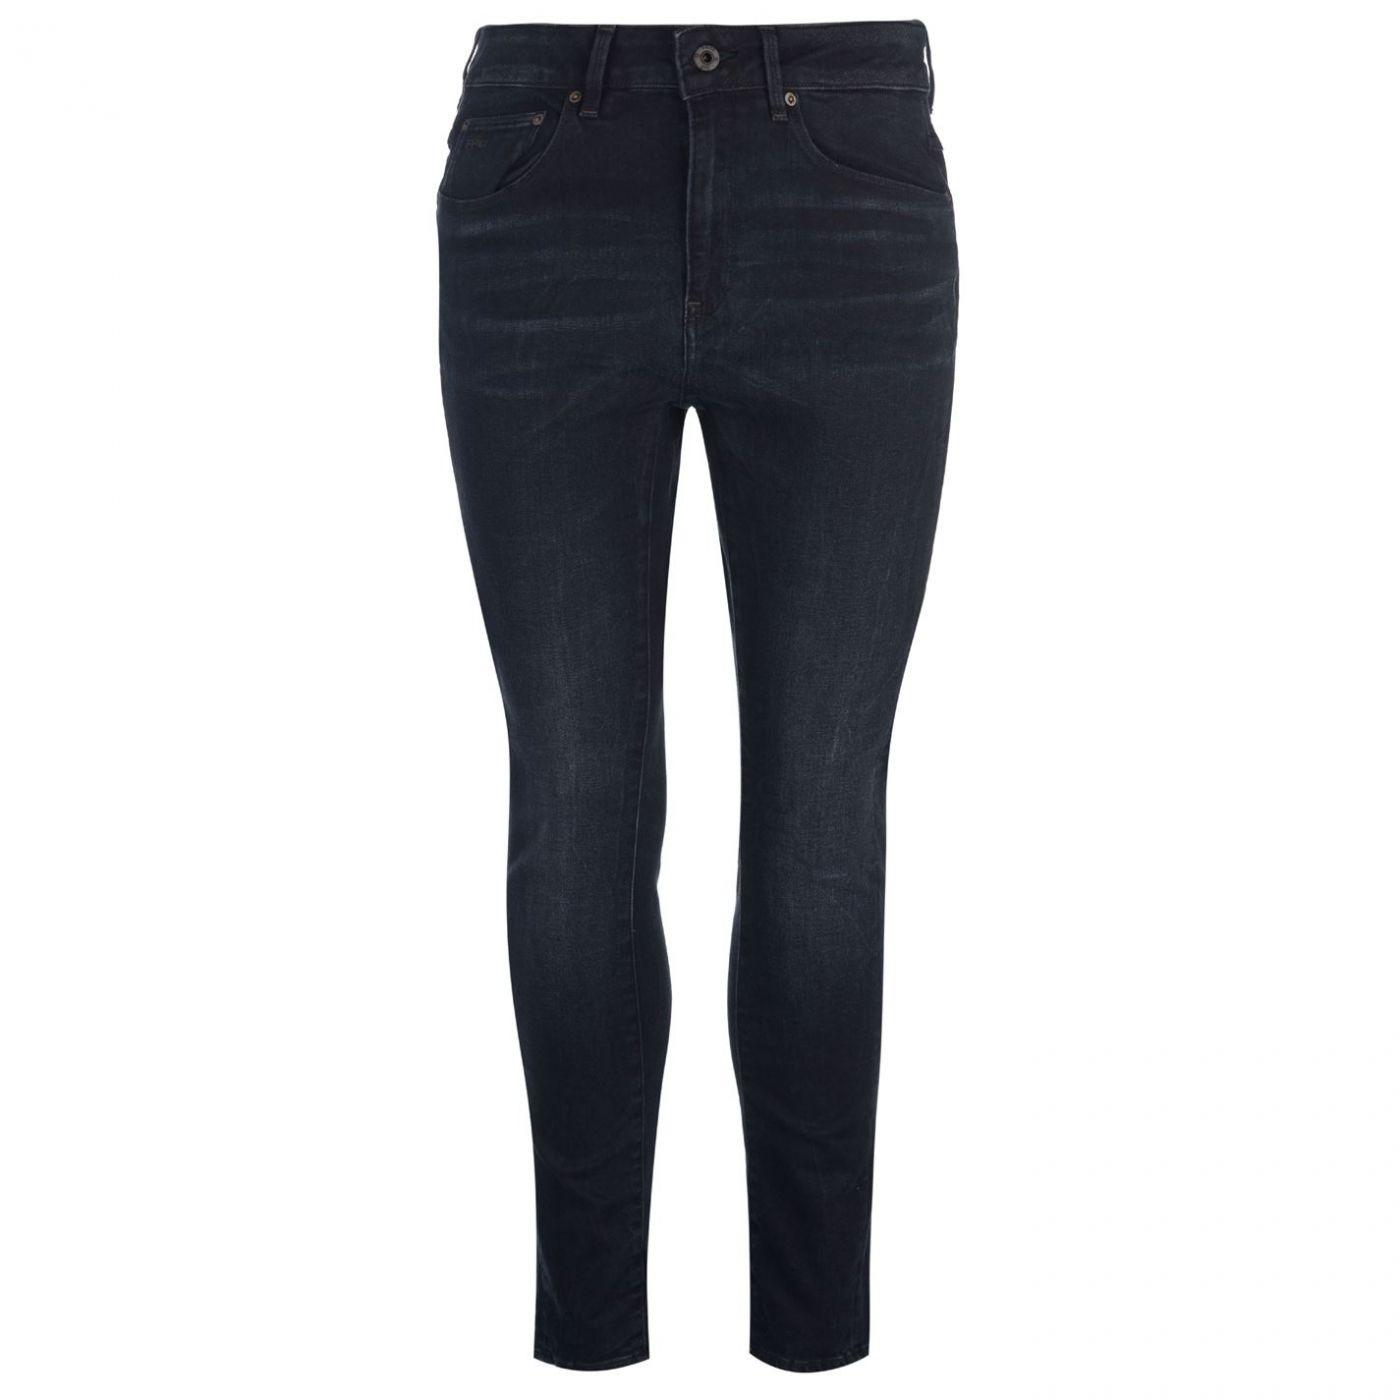 G Star Low Boyfriend Jeans Womens